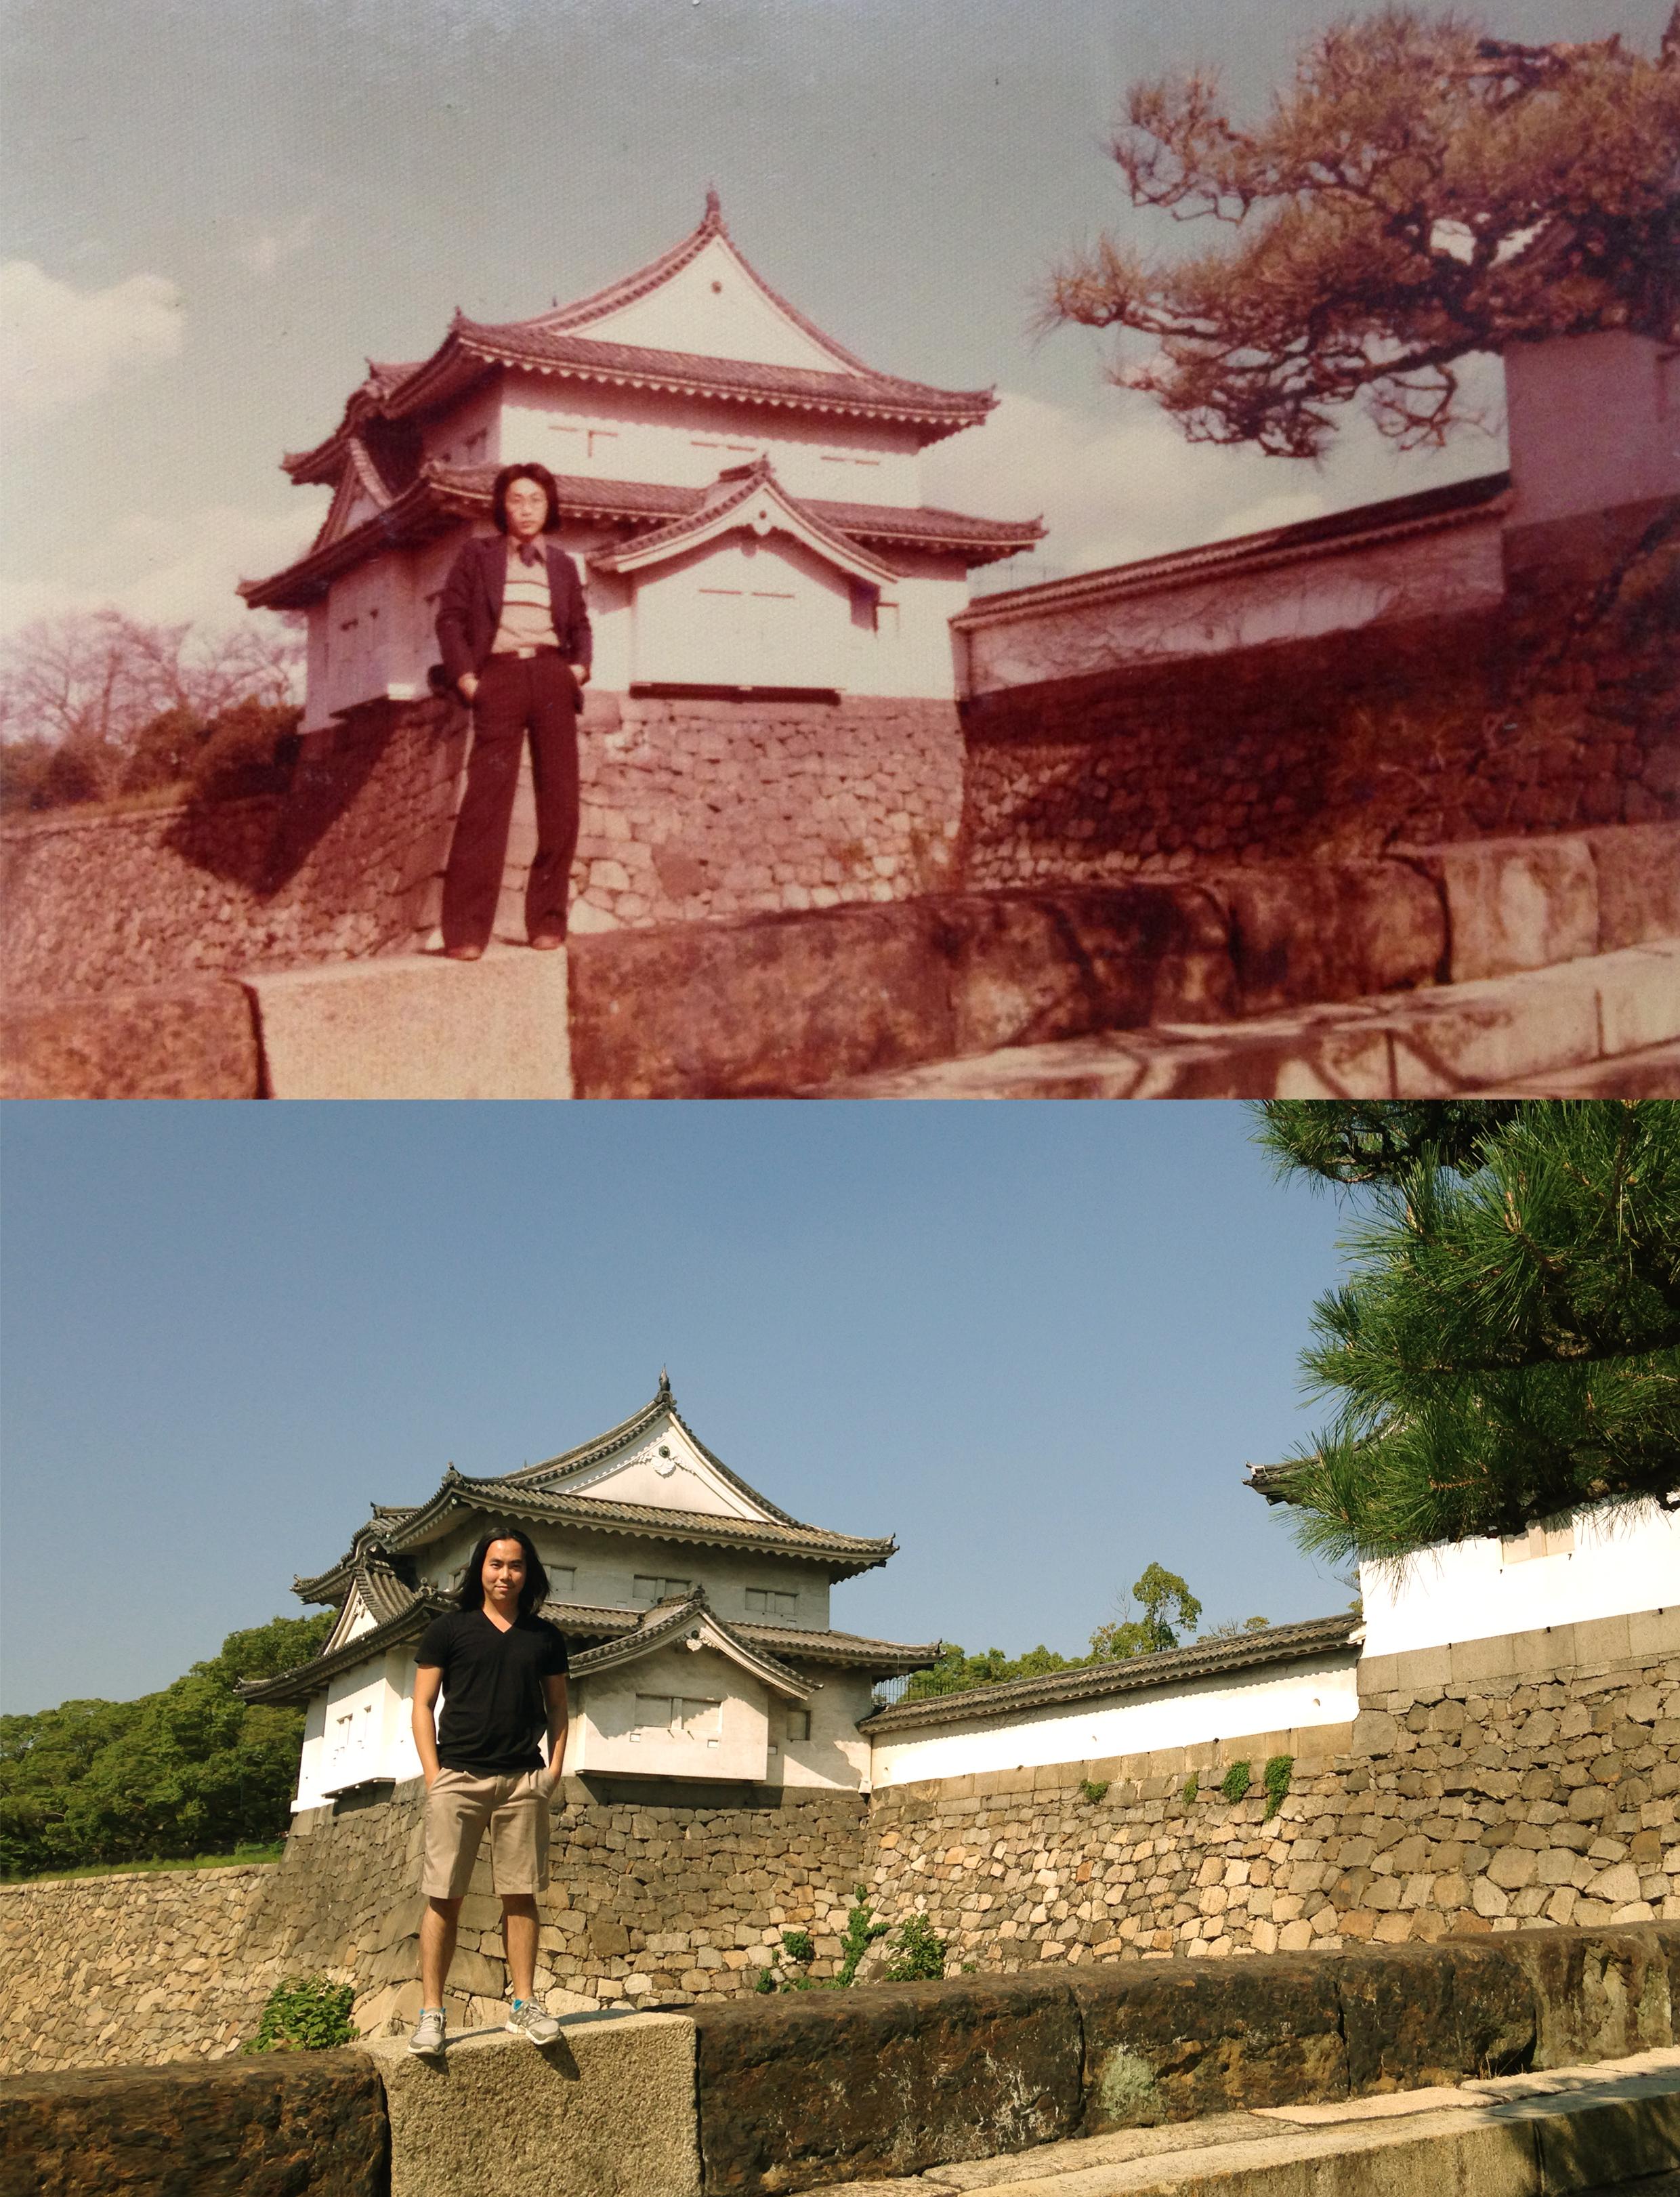 Above: Dad, 1979. Below: Me, 2013 at Osaka Castle.